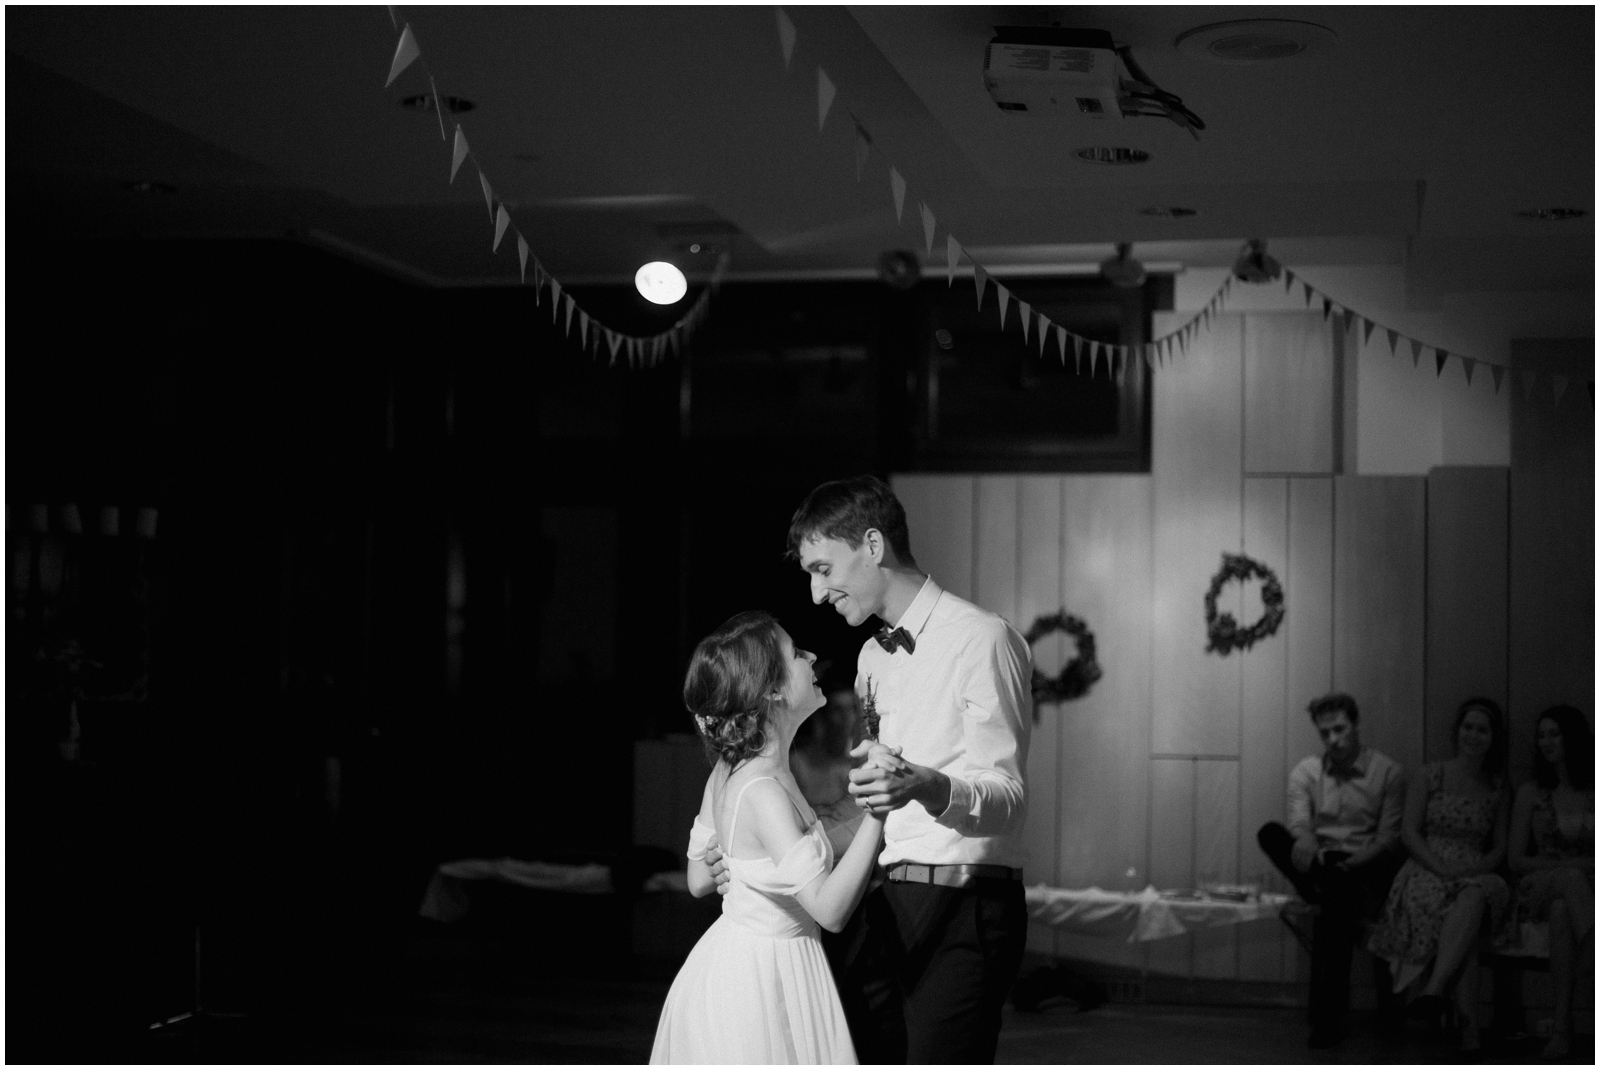 mirjam_thomas_wedding-695-2.jpg